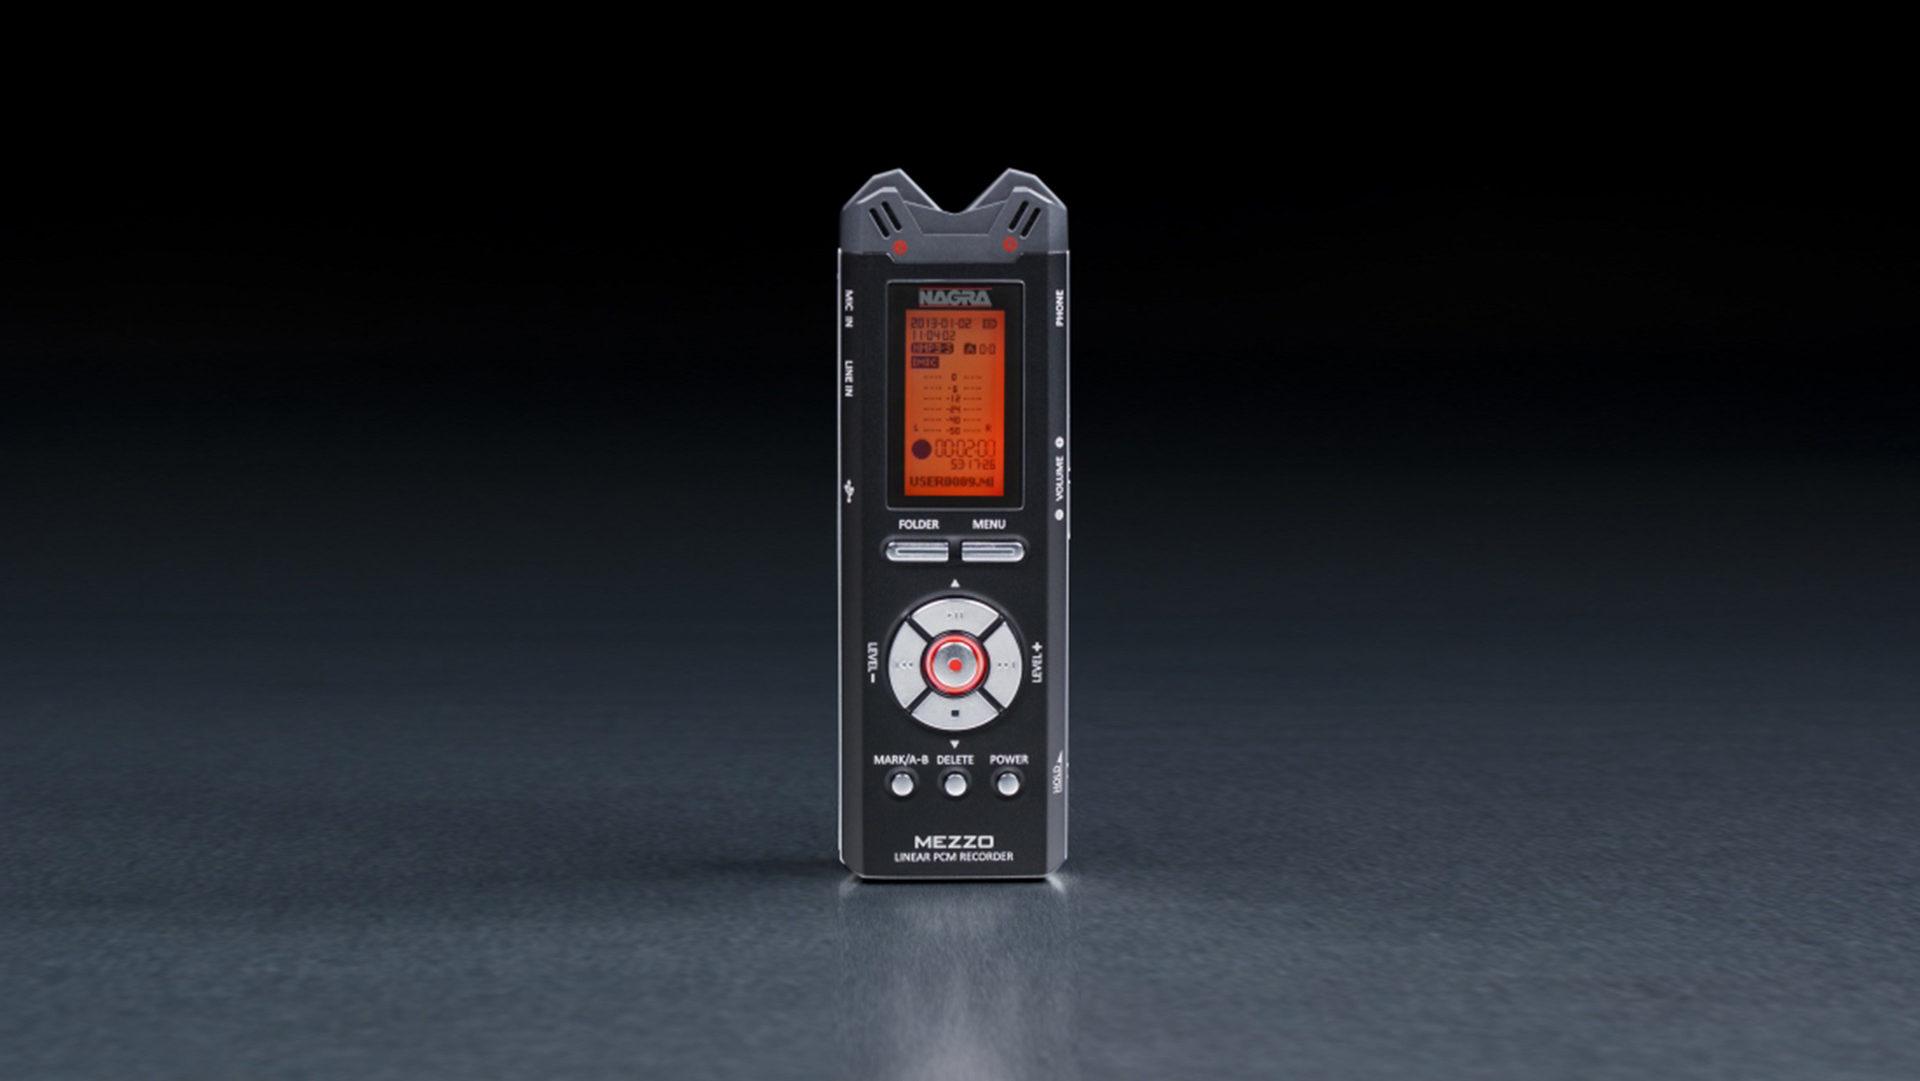 Nagra Mezzo miniature recorder handheld digital front rec button